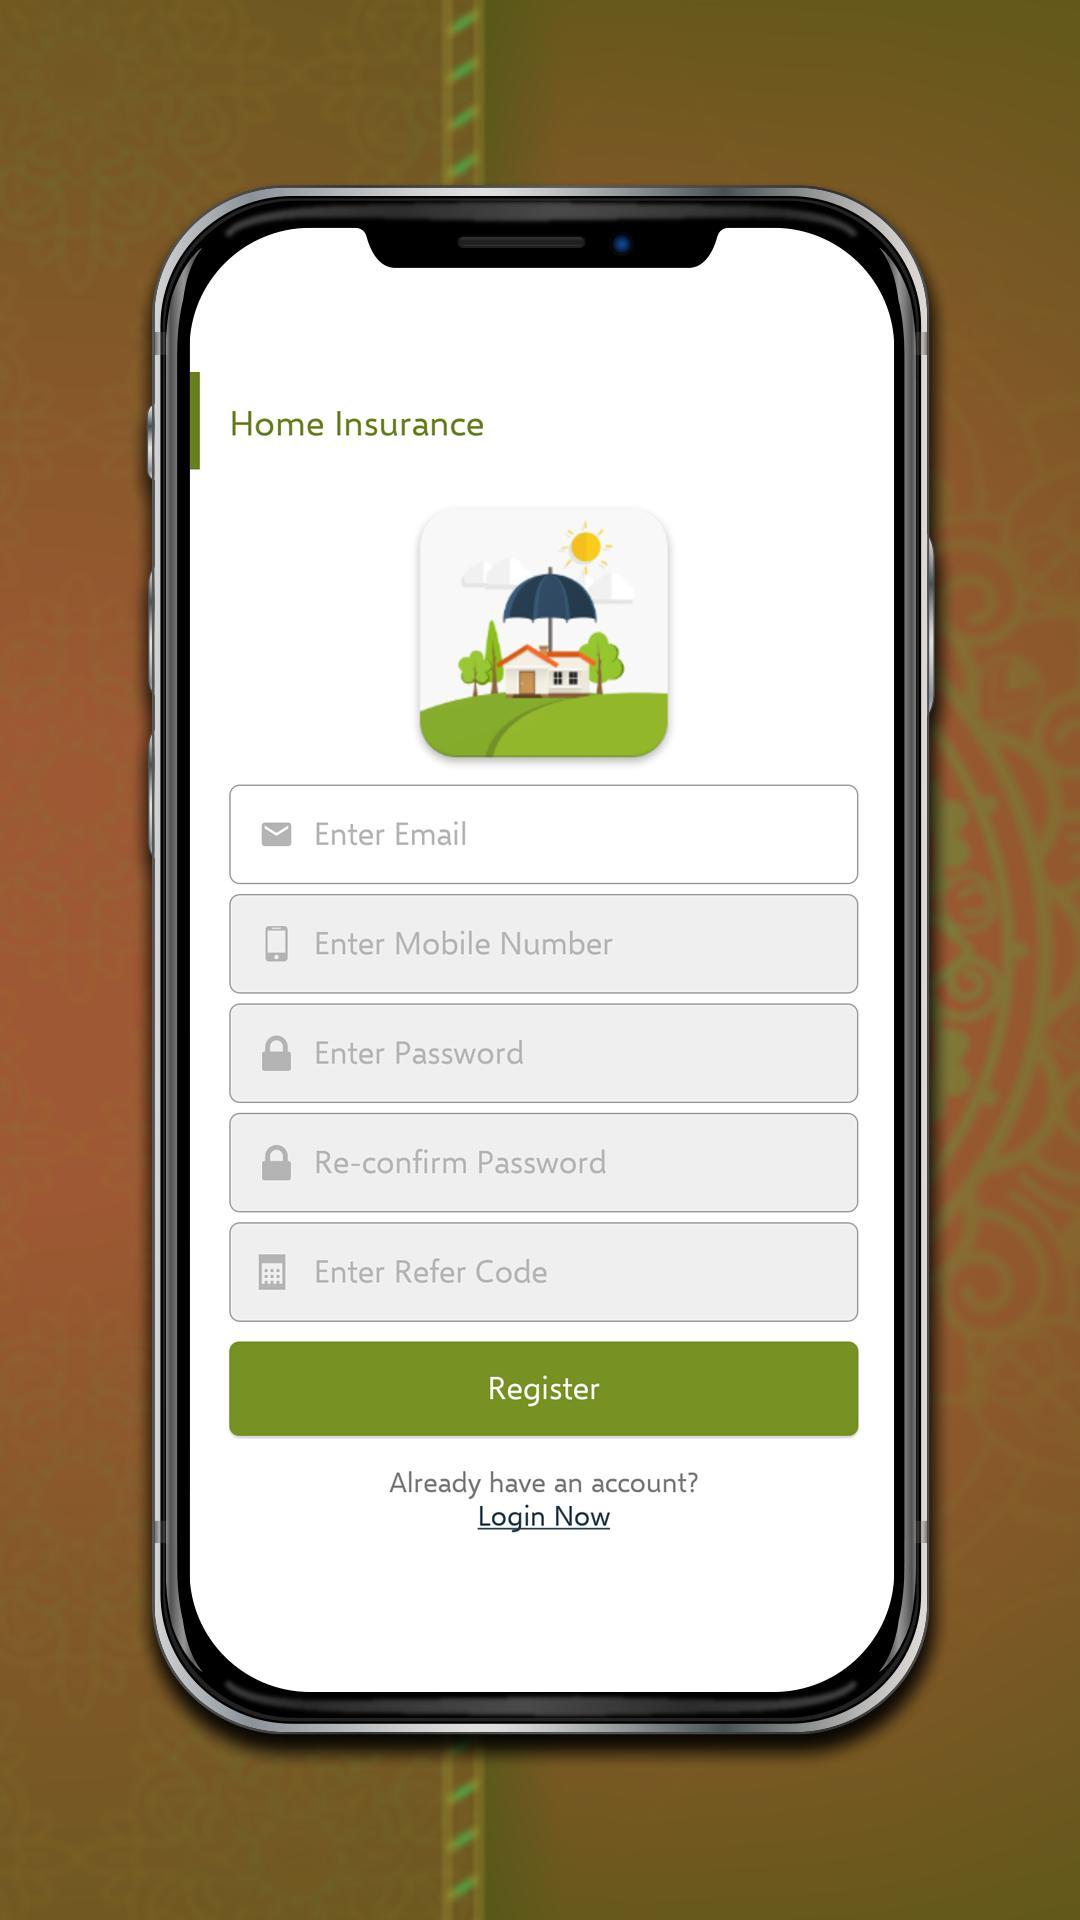 Home Insurance Apk Download – Home Insurance Apk App – Home Insurance Apk Client New 2021* 4